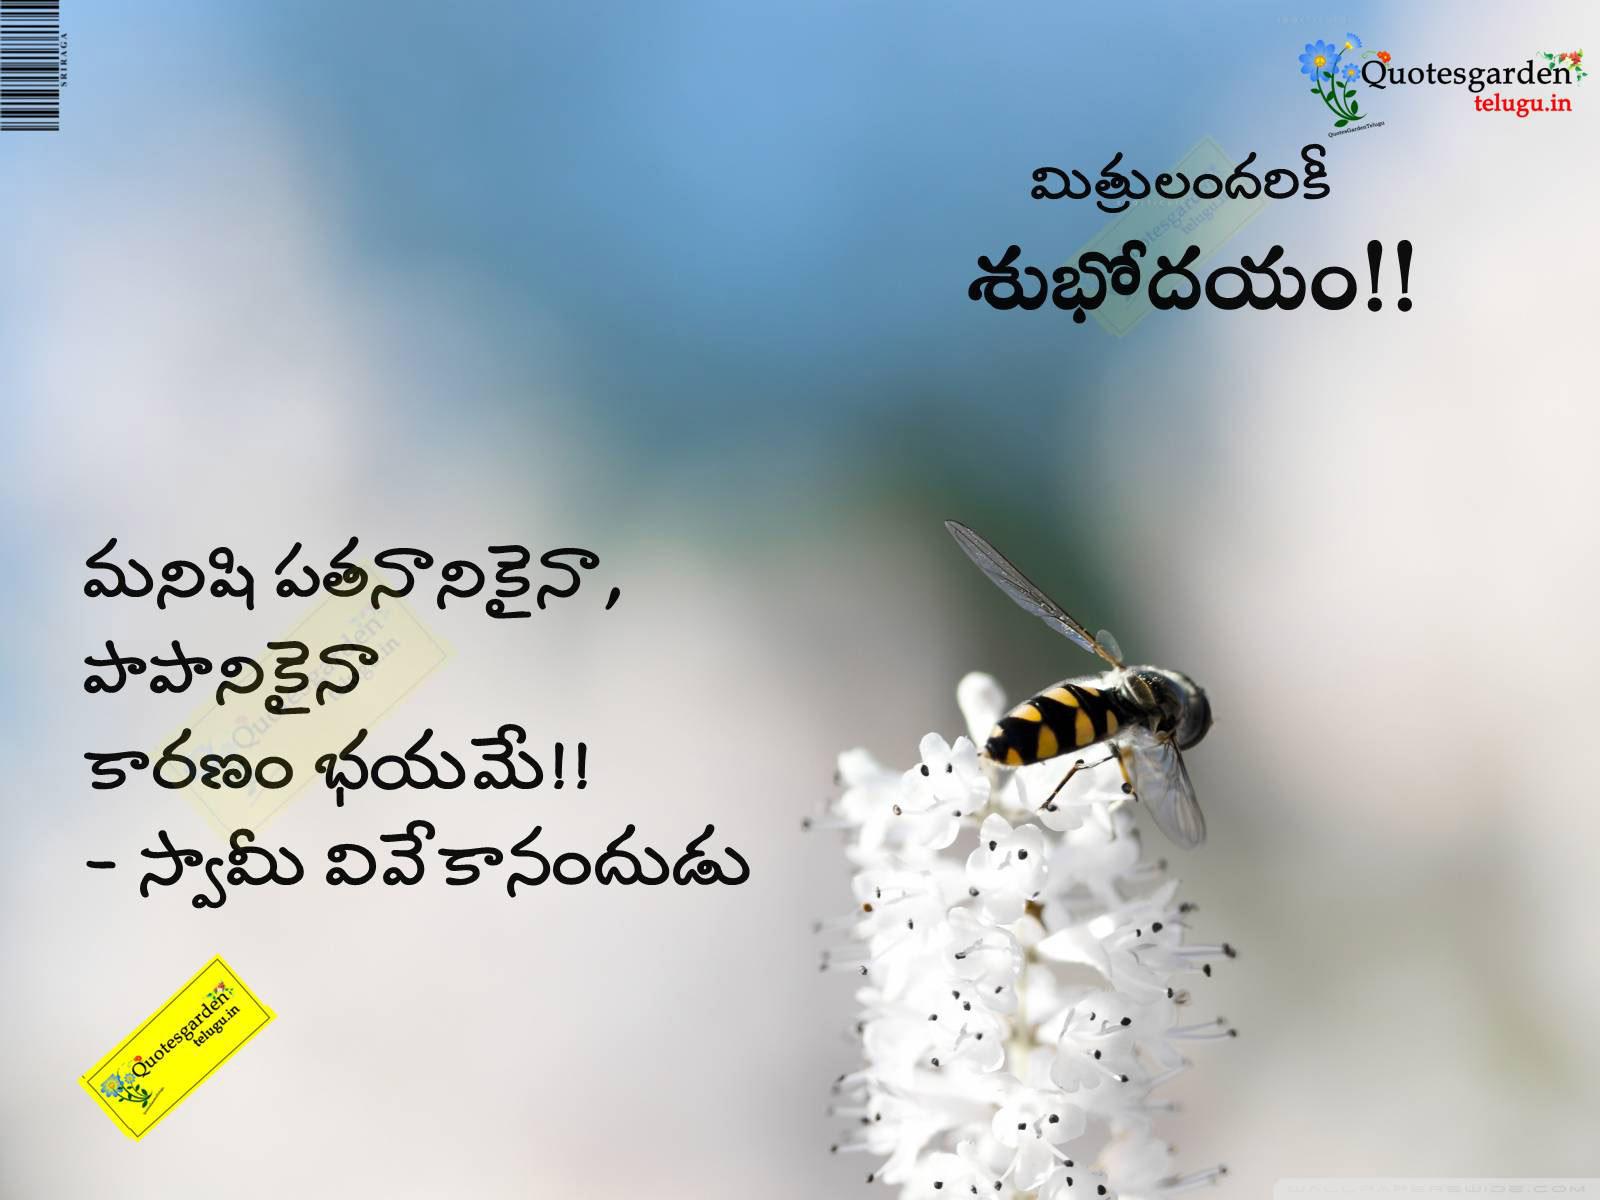 swami vivekananda best inspirational quotes best telugu